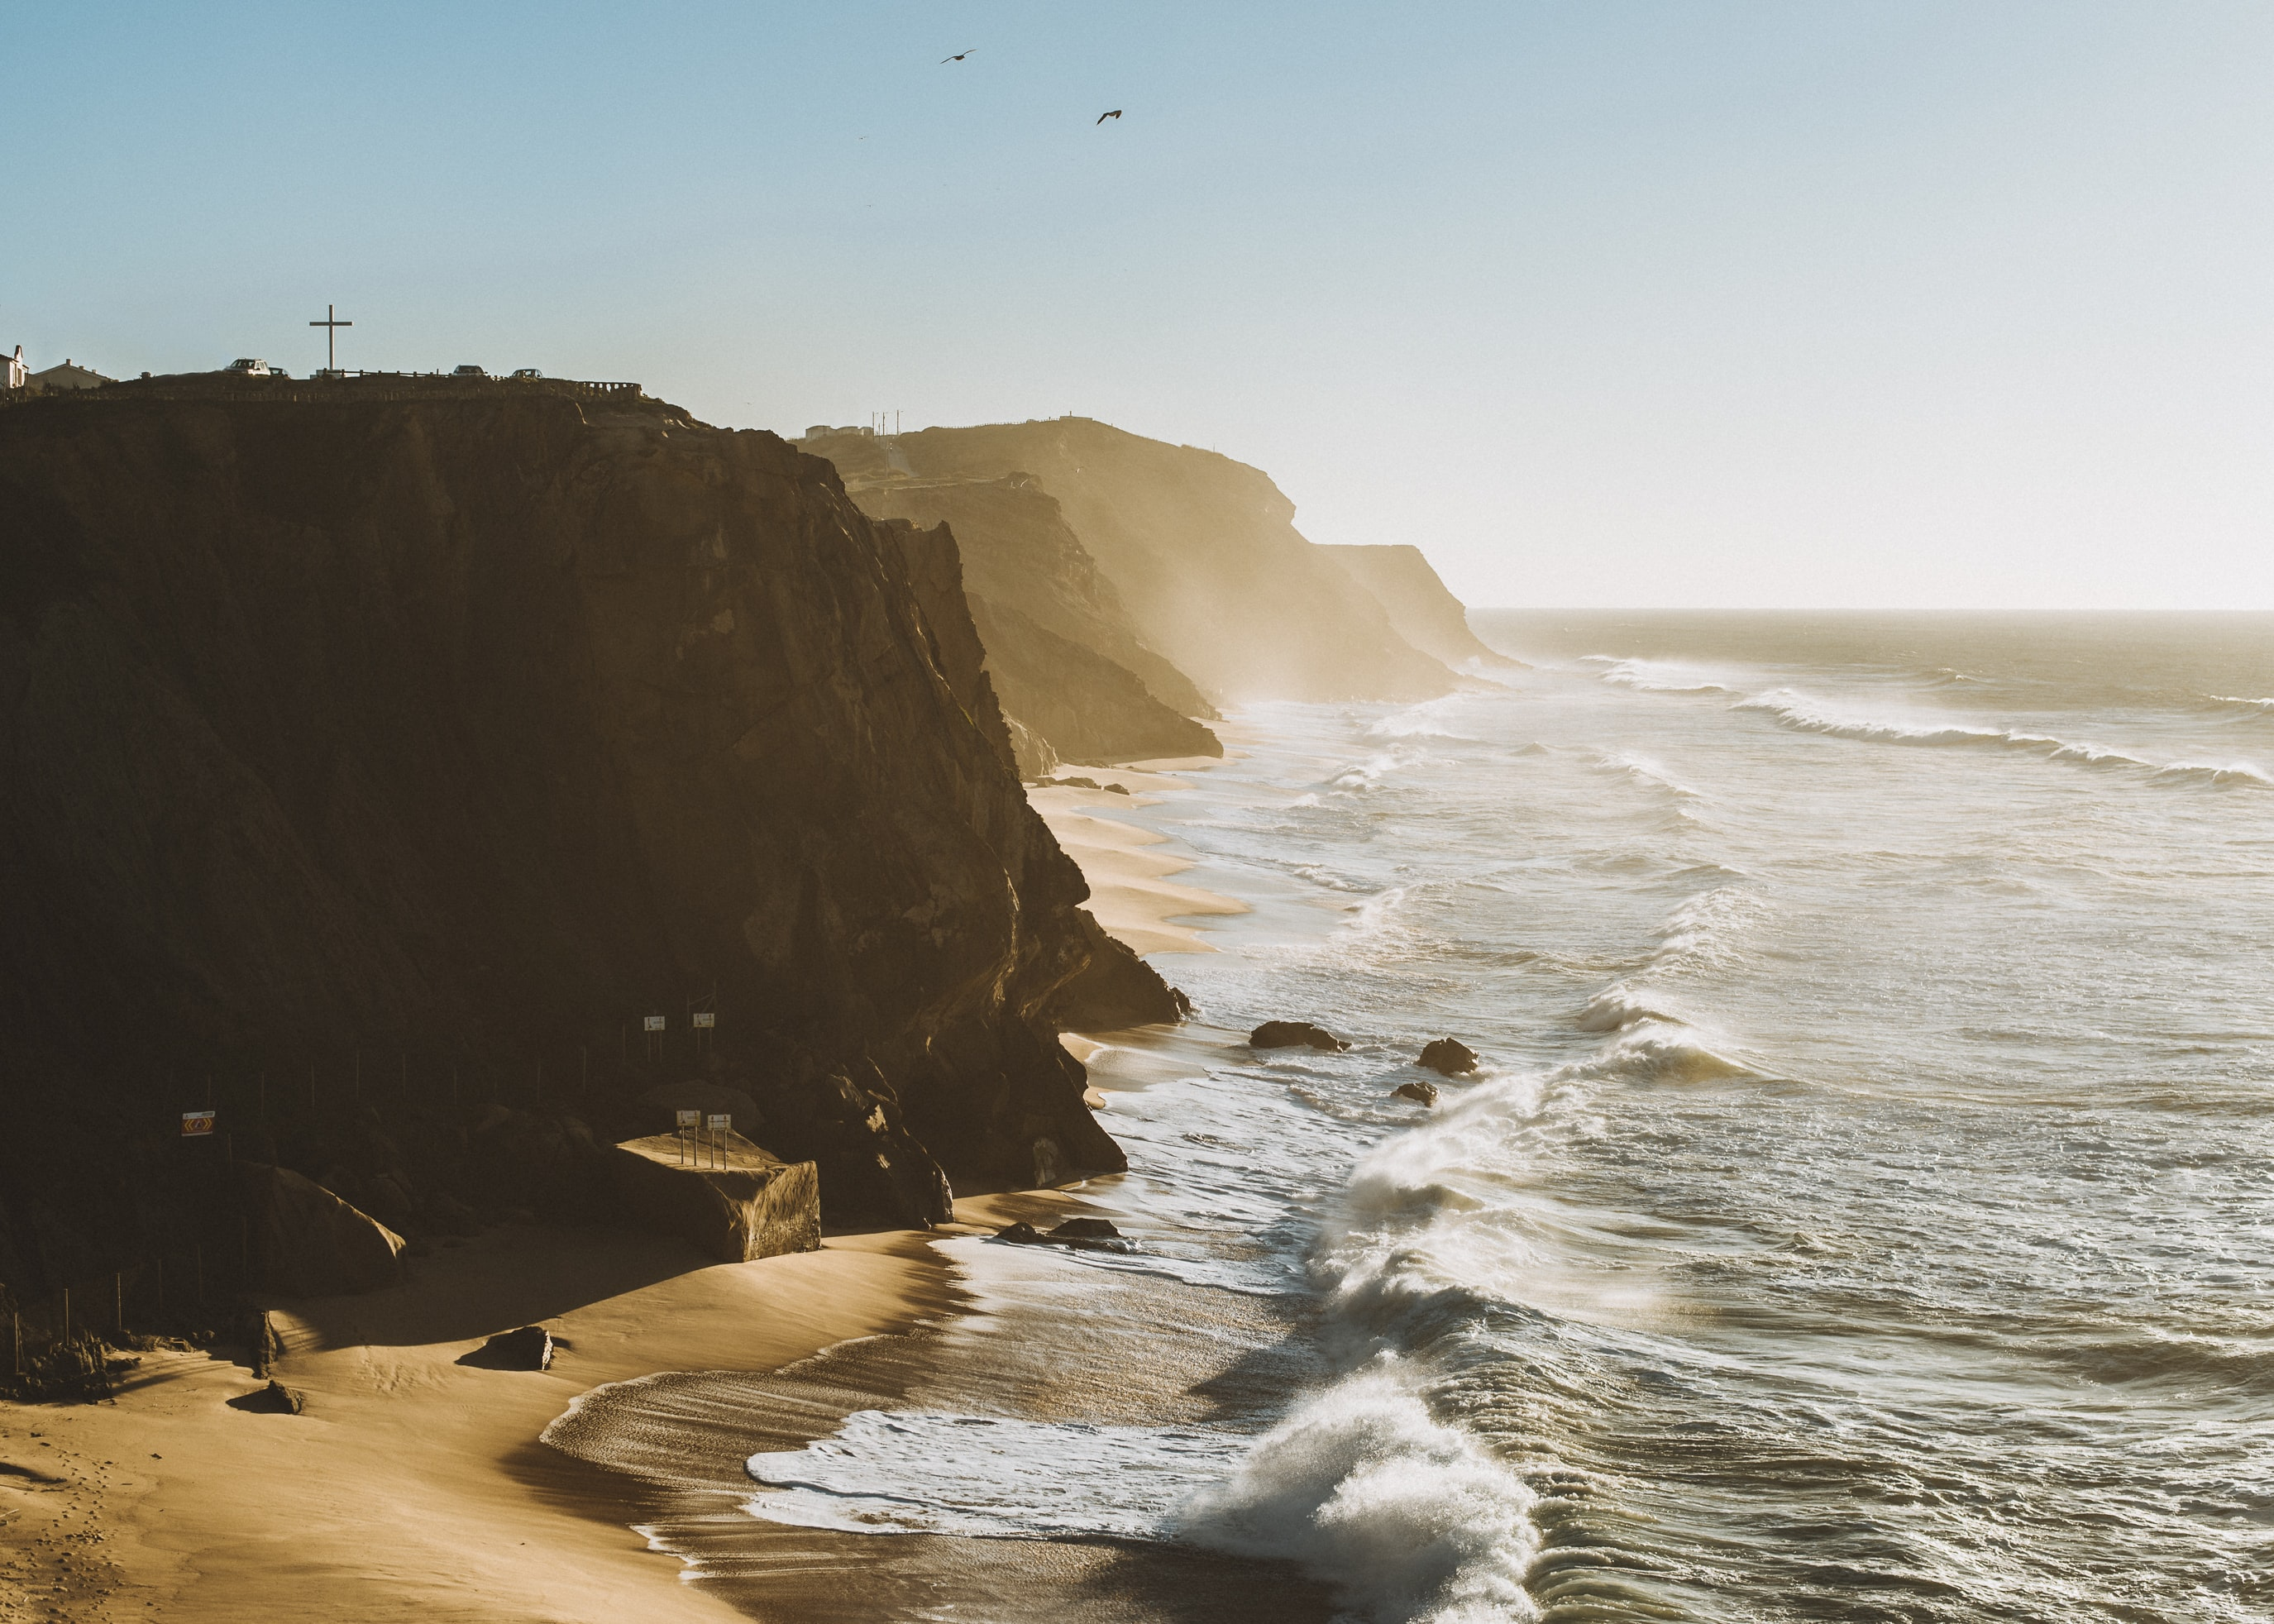 Ocean waves crashing on the sand beach with cliffs in Santa Cruz